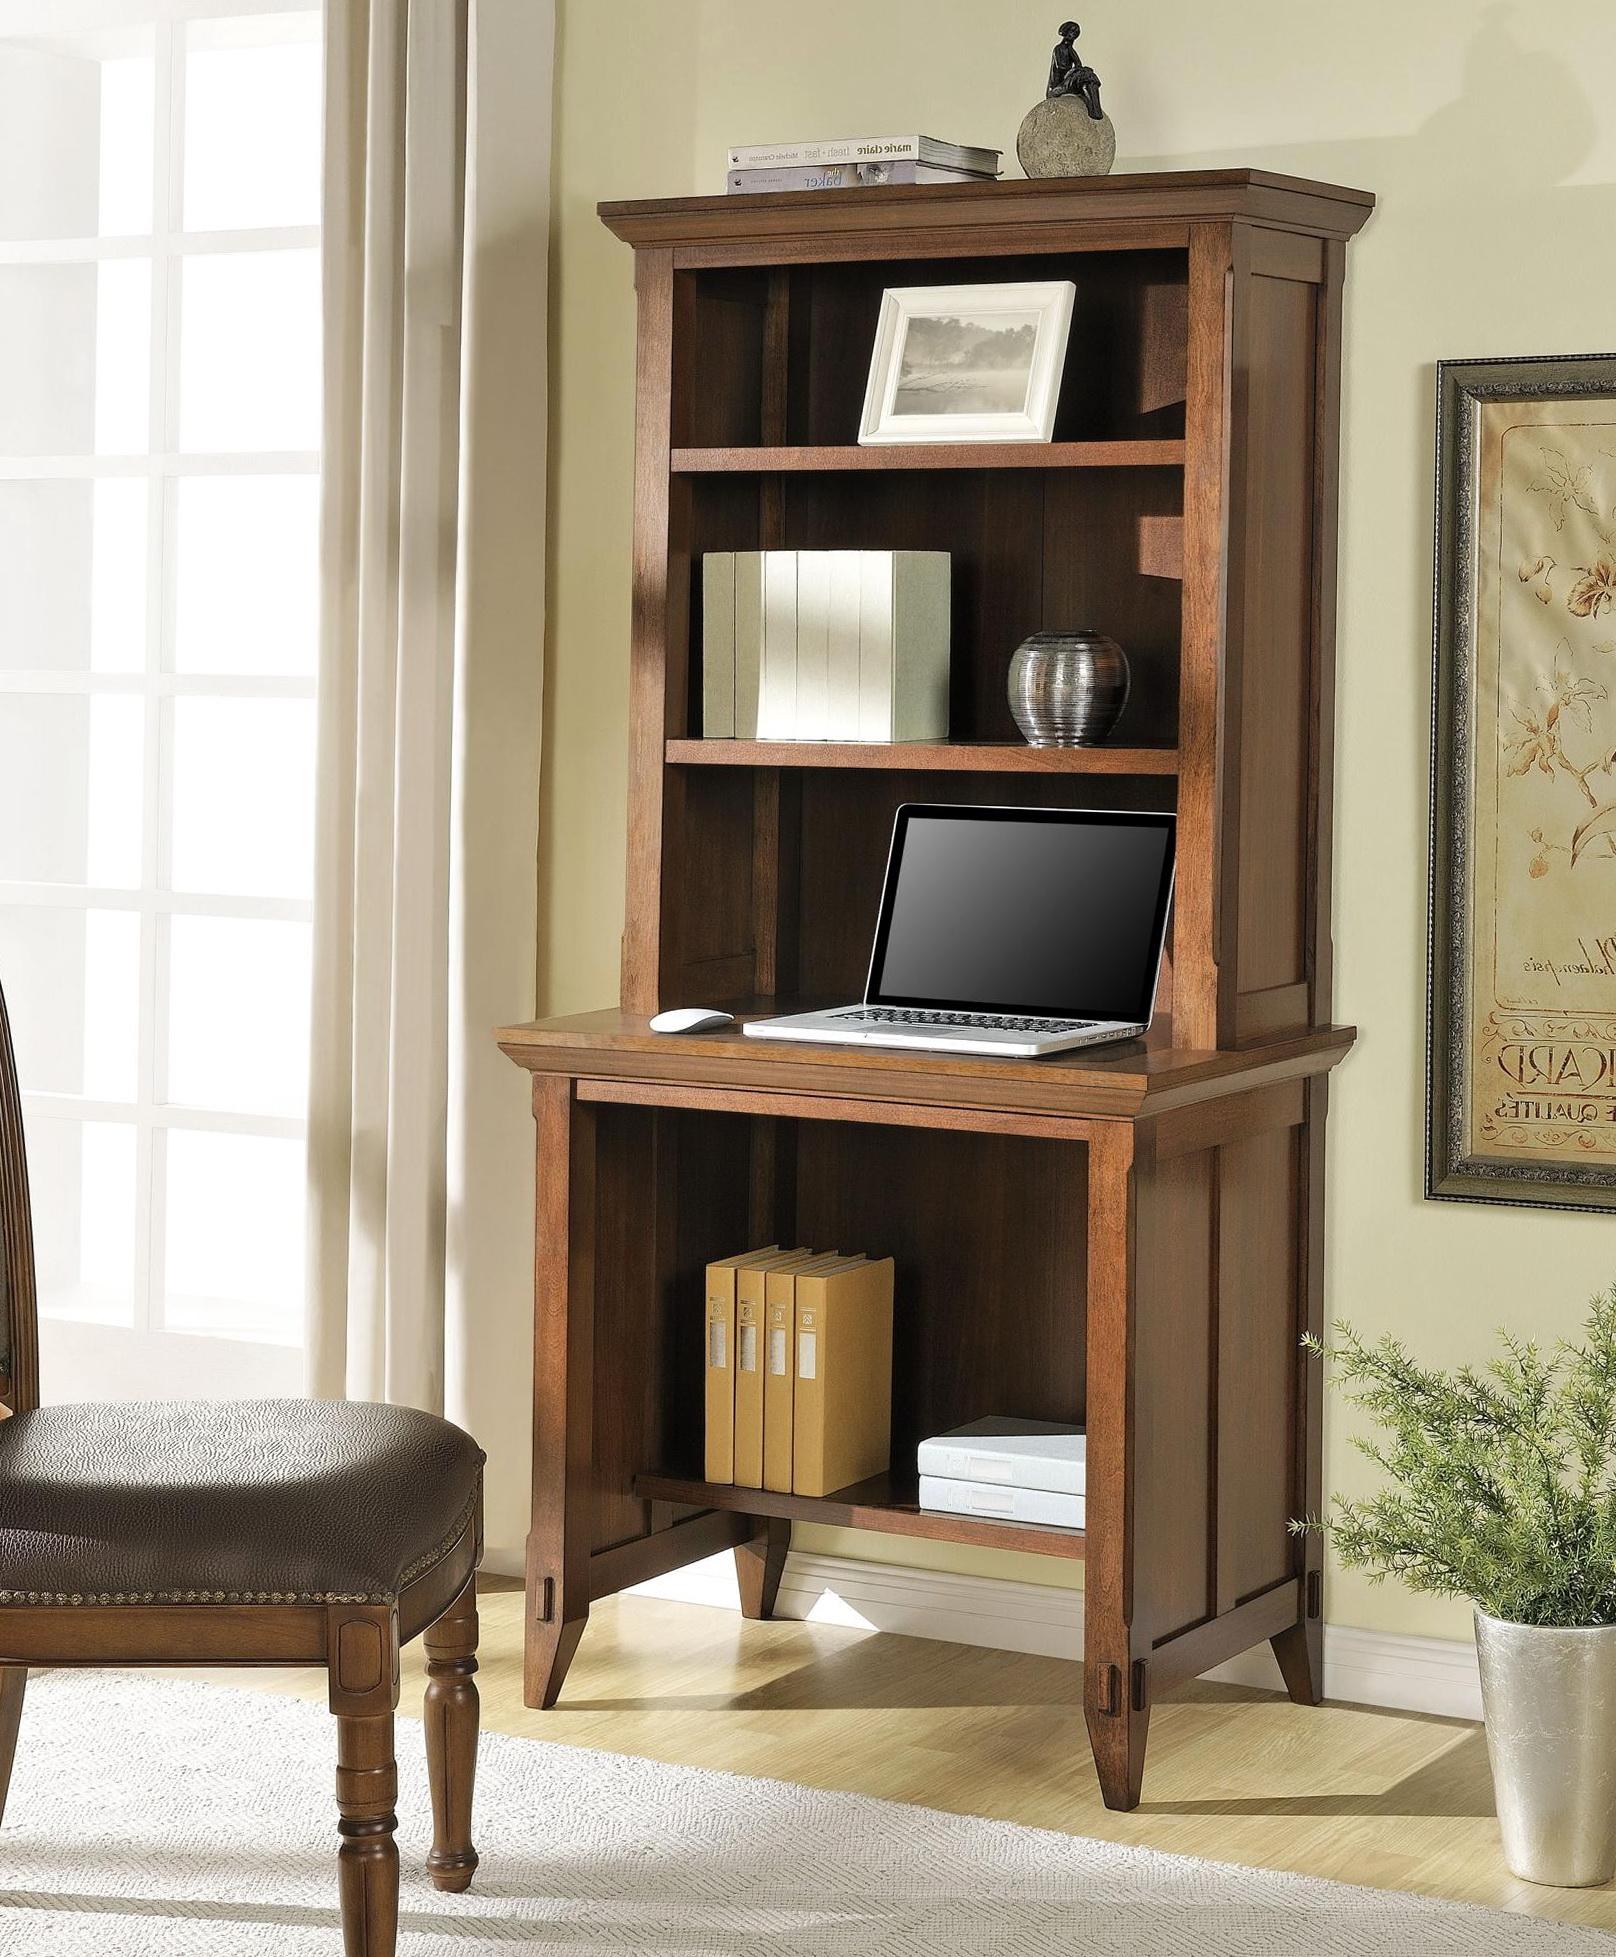 Desk With Bookshelf On Top